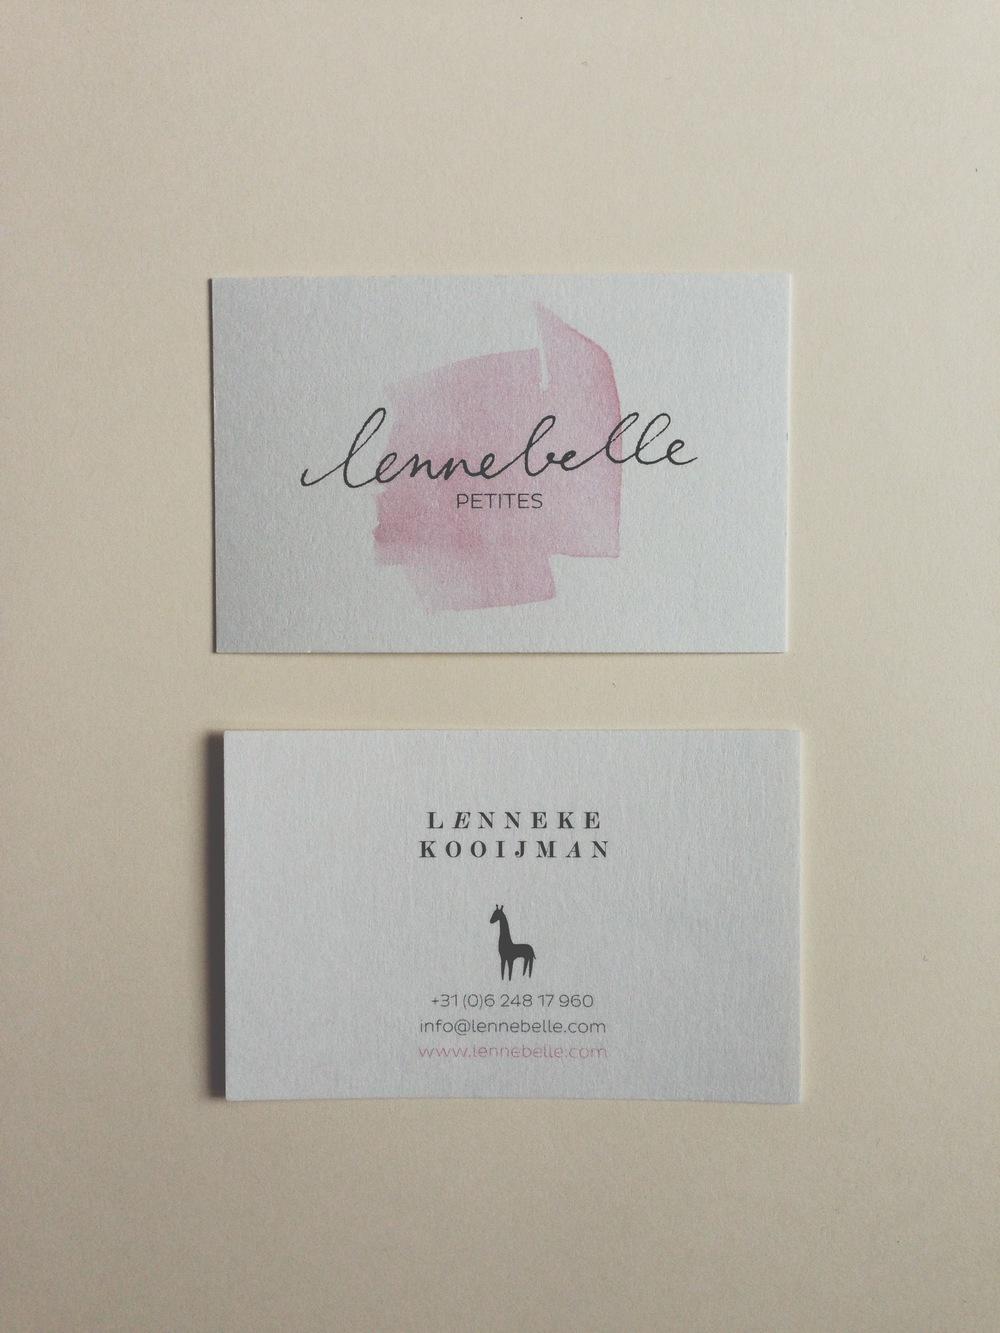 Lennebelle Petites graphic identity